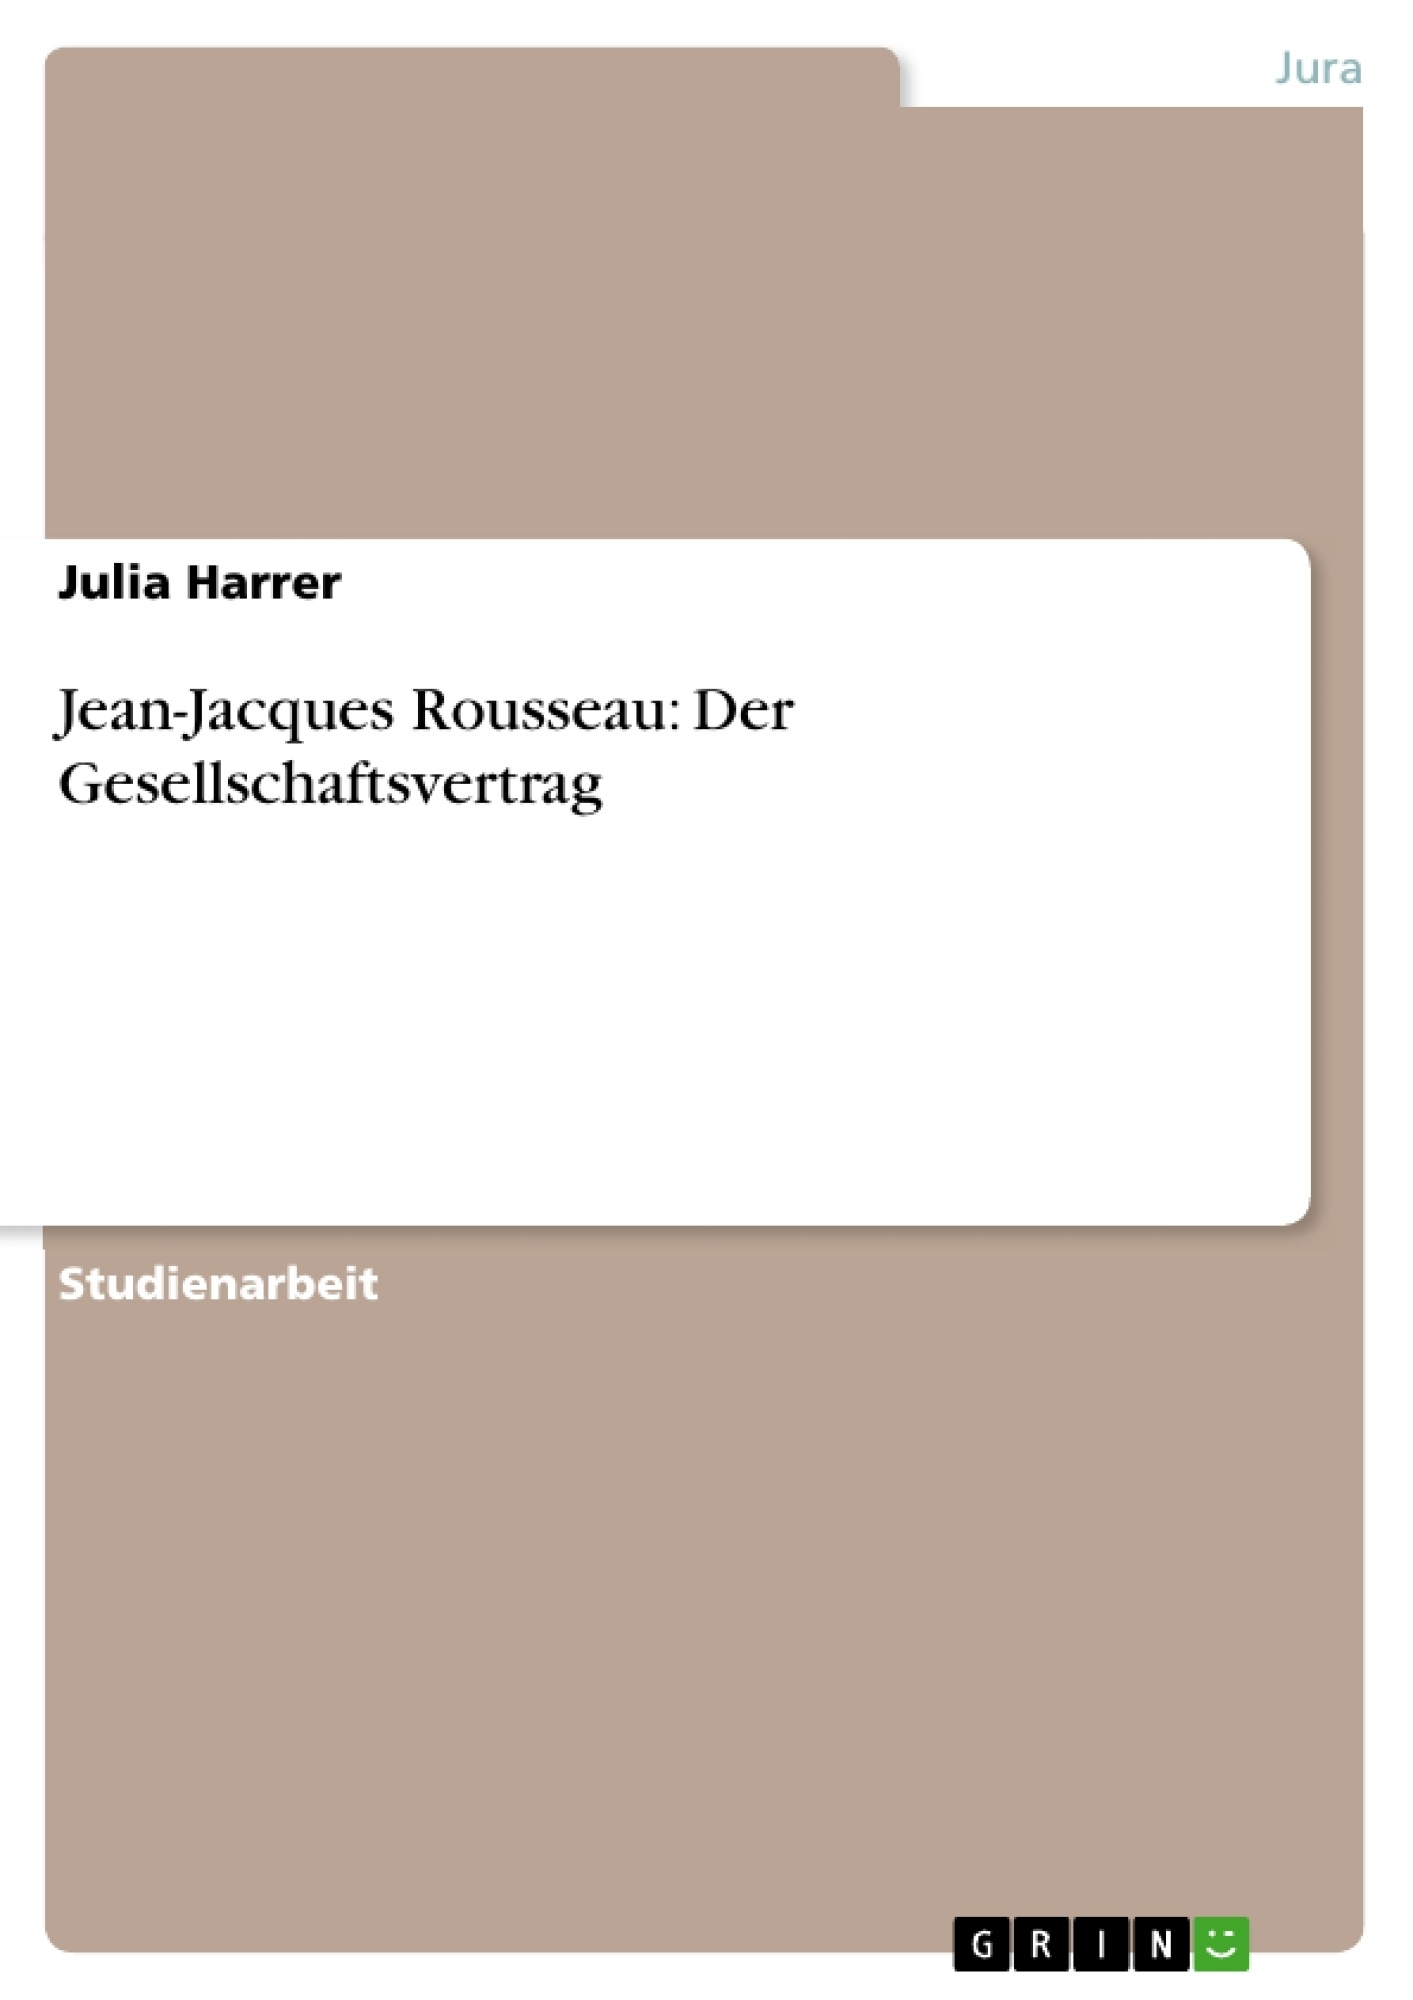 Titel: Jean-Jacques Rousseau: Der Gesellschaftsvertrag